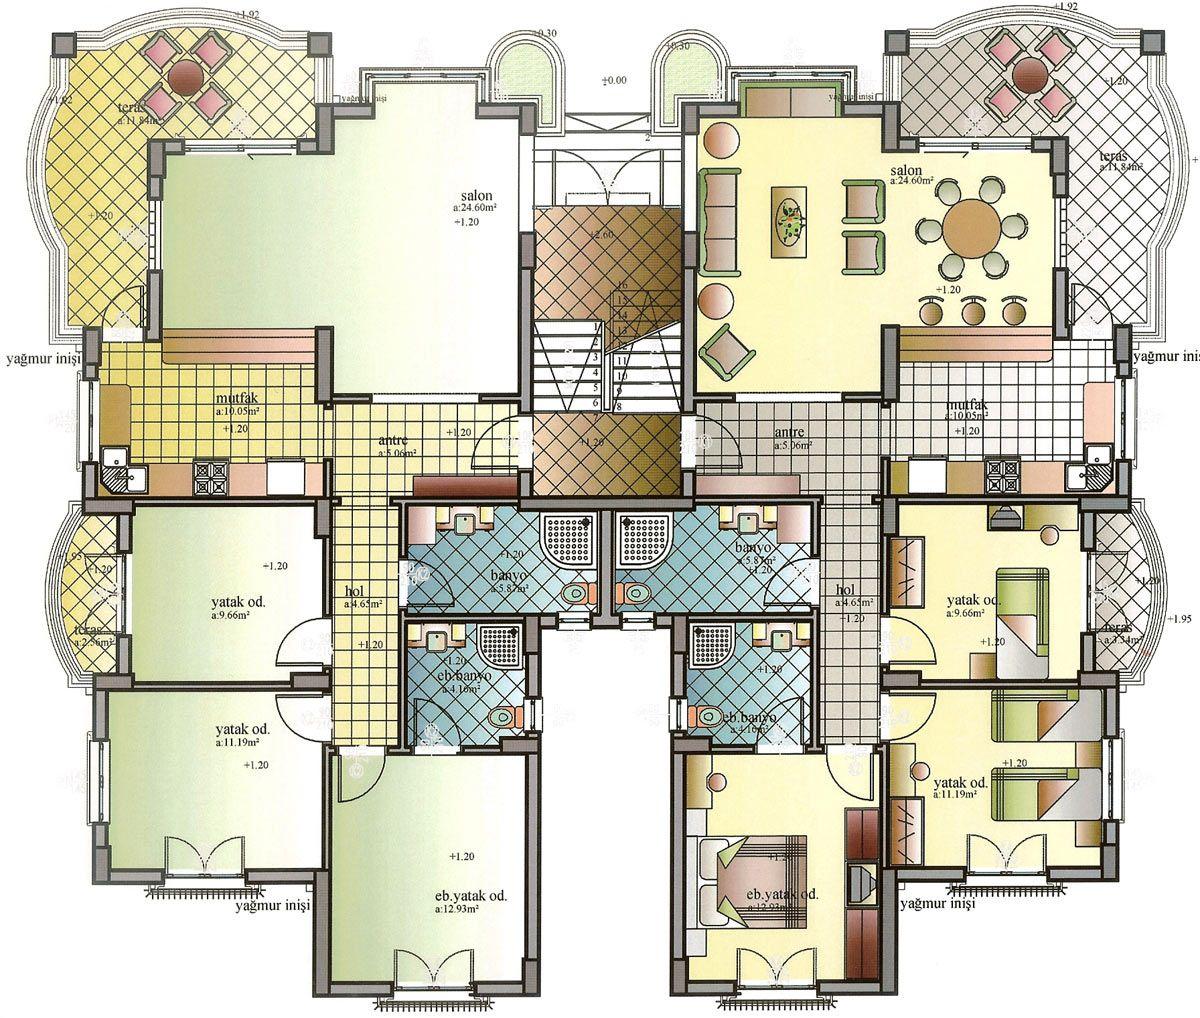 Wonderful Apartment Floor Plans Designs Luxury House Plans Bedroom House Plans Minecraft Houses Blueprints